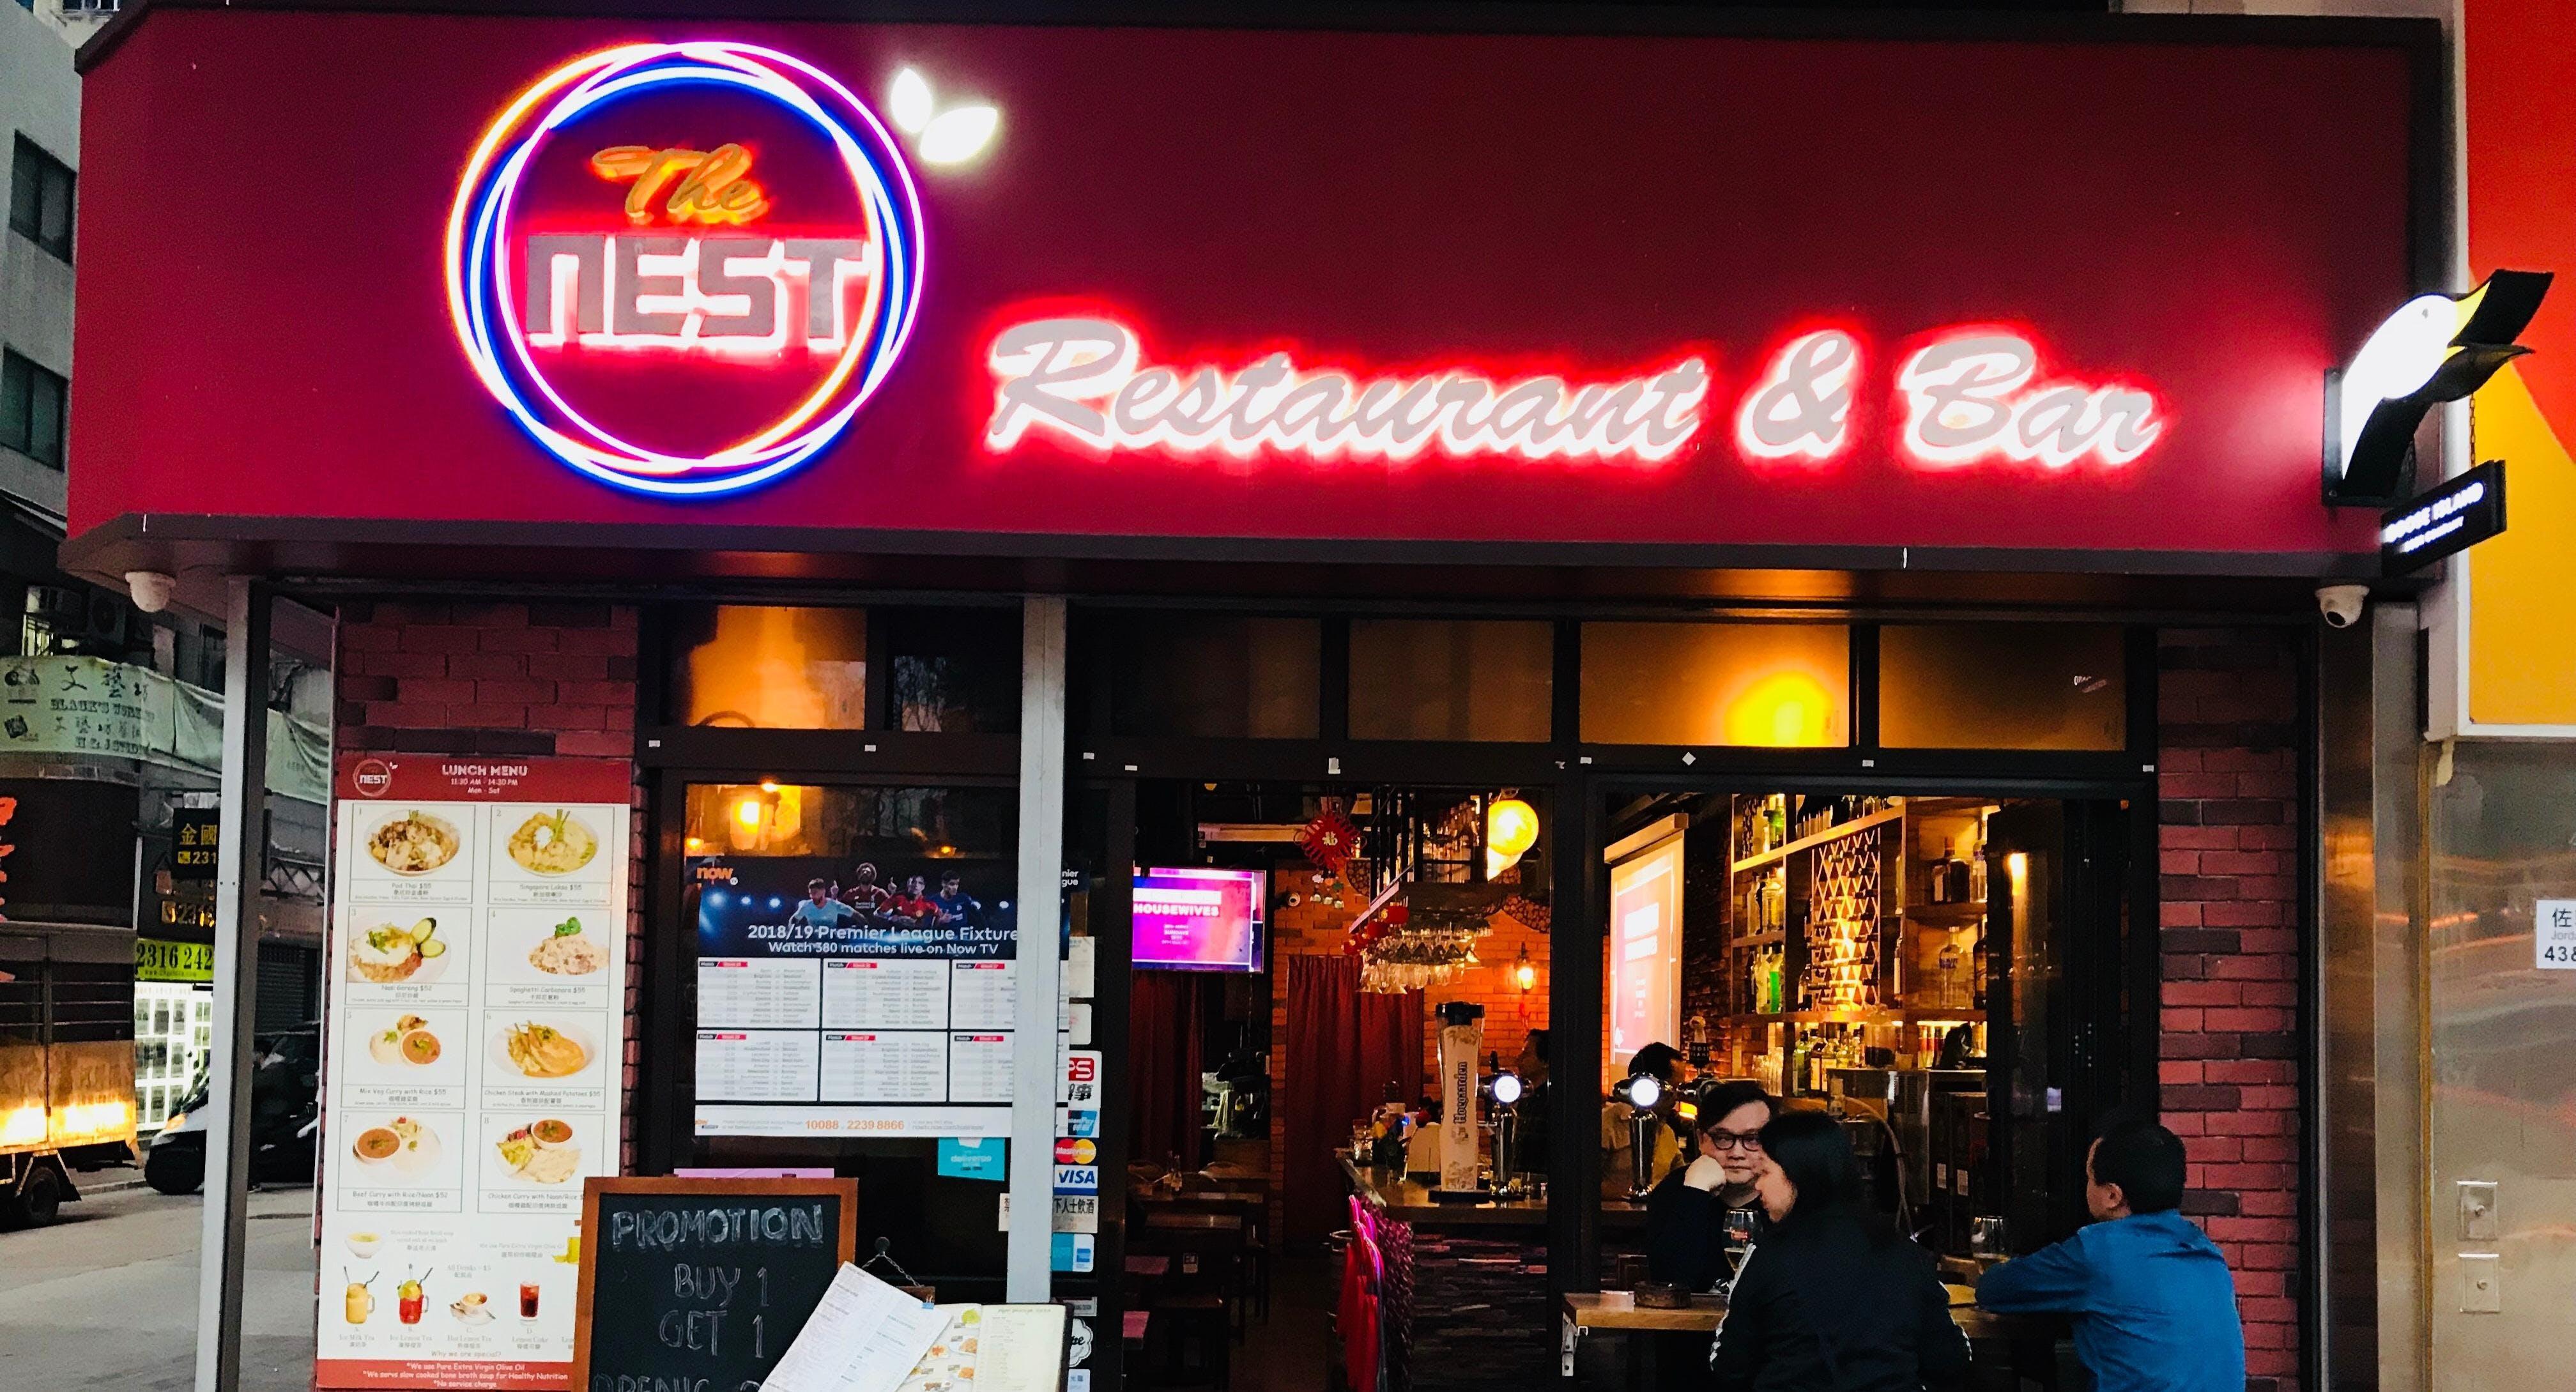 The Nest Restaurant & Bar Hong Kong image 2